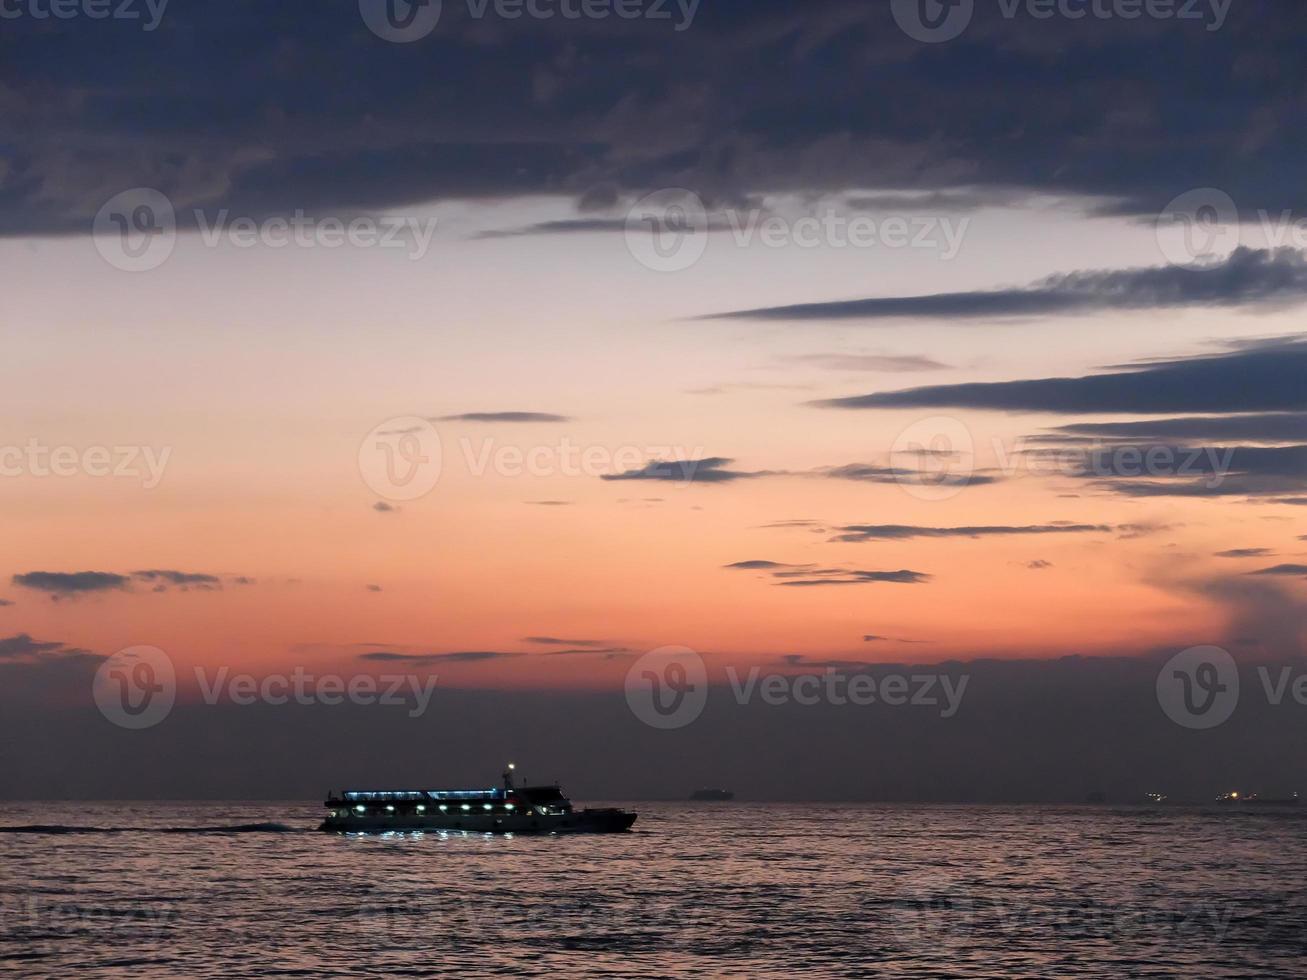 Istanbul Fähre segelt in Bosporus Meer, Istanbul, Truthahn foto